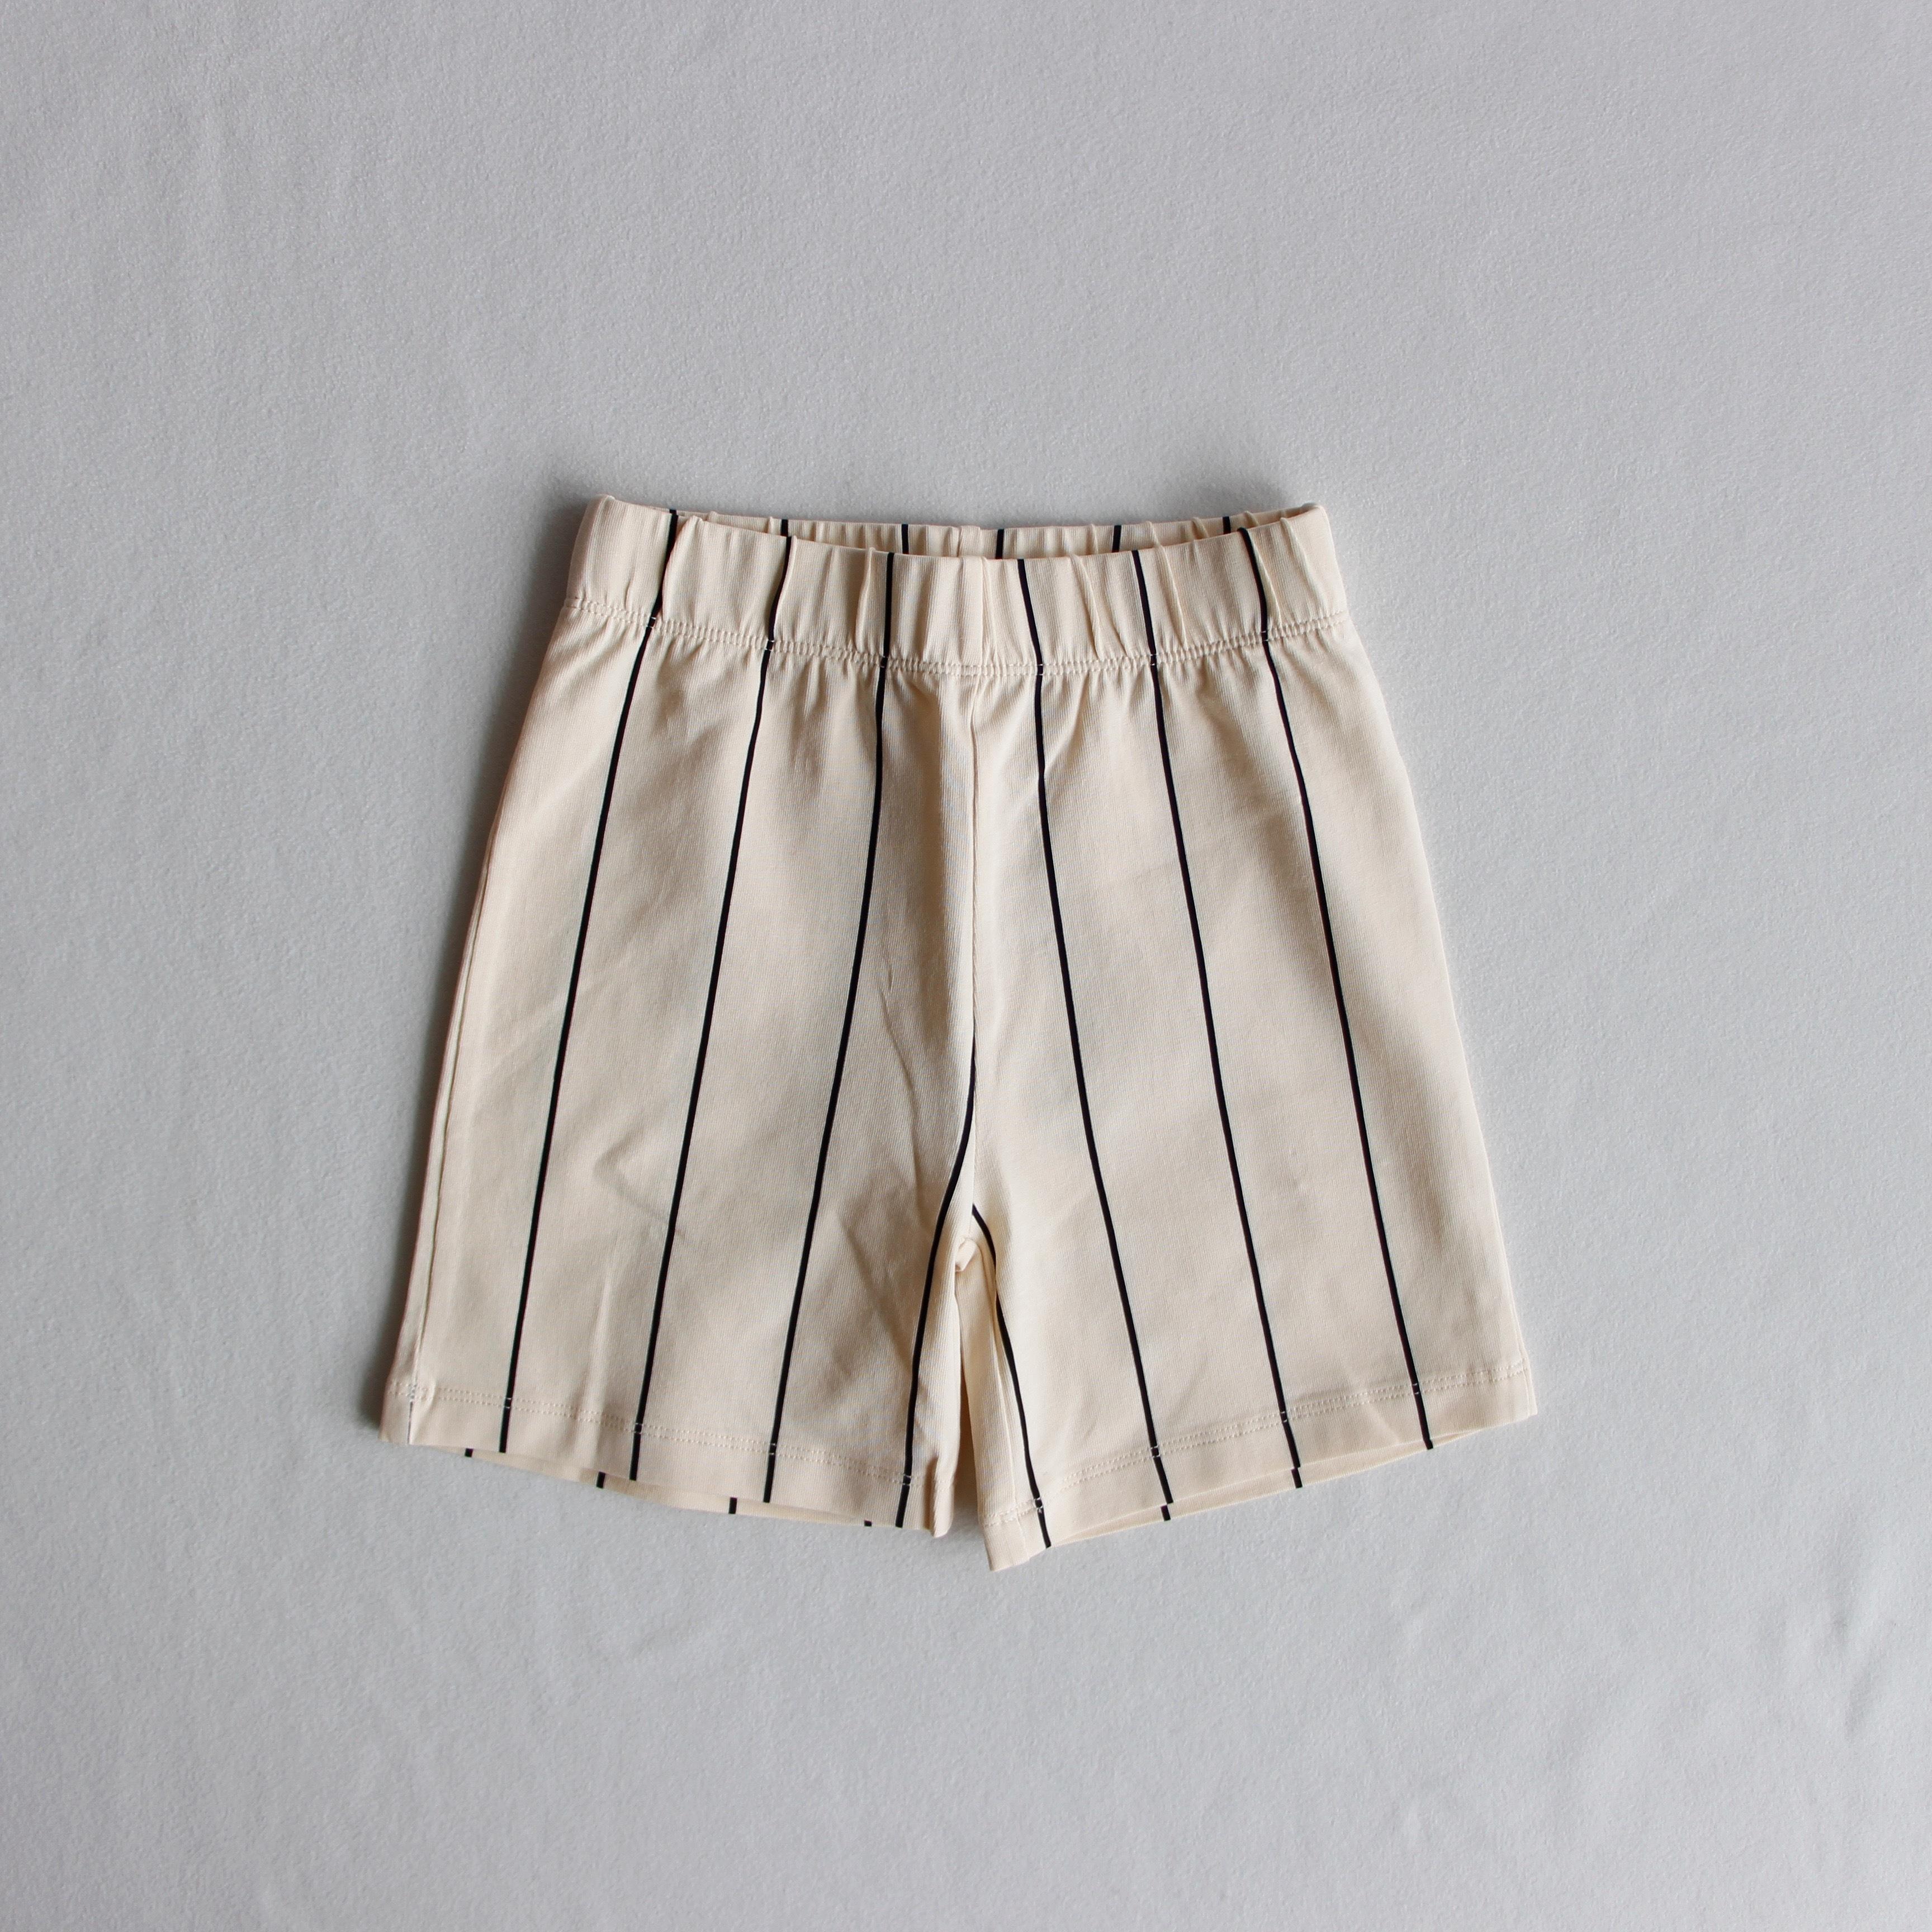 《WAWA 2019SS》Shorts / black lines